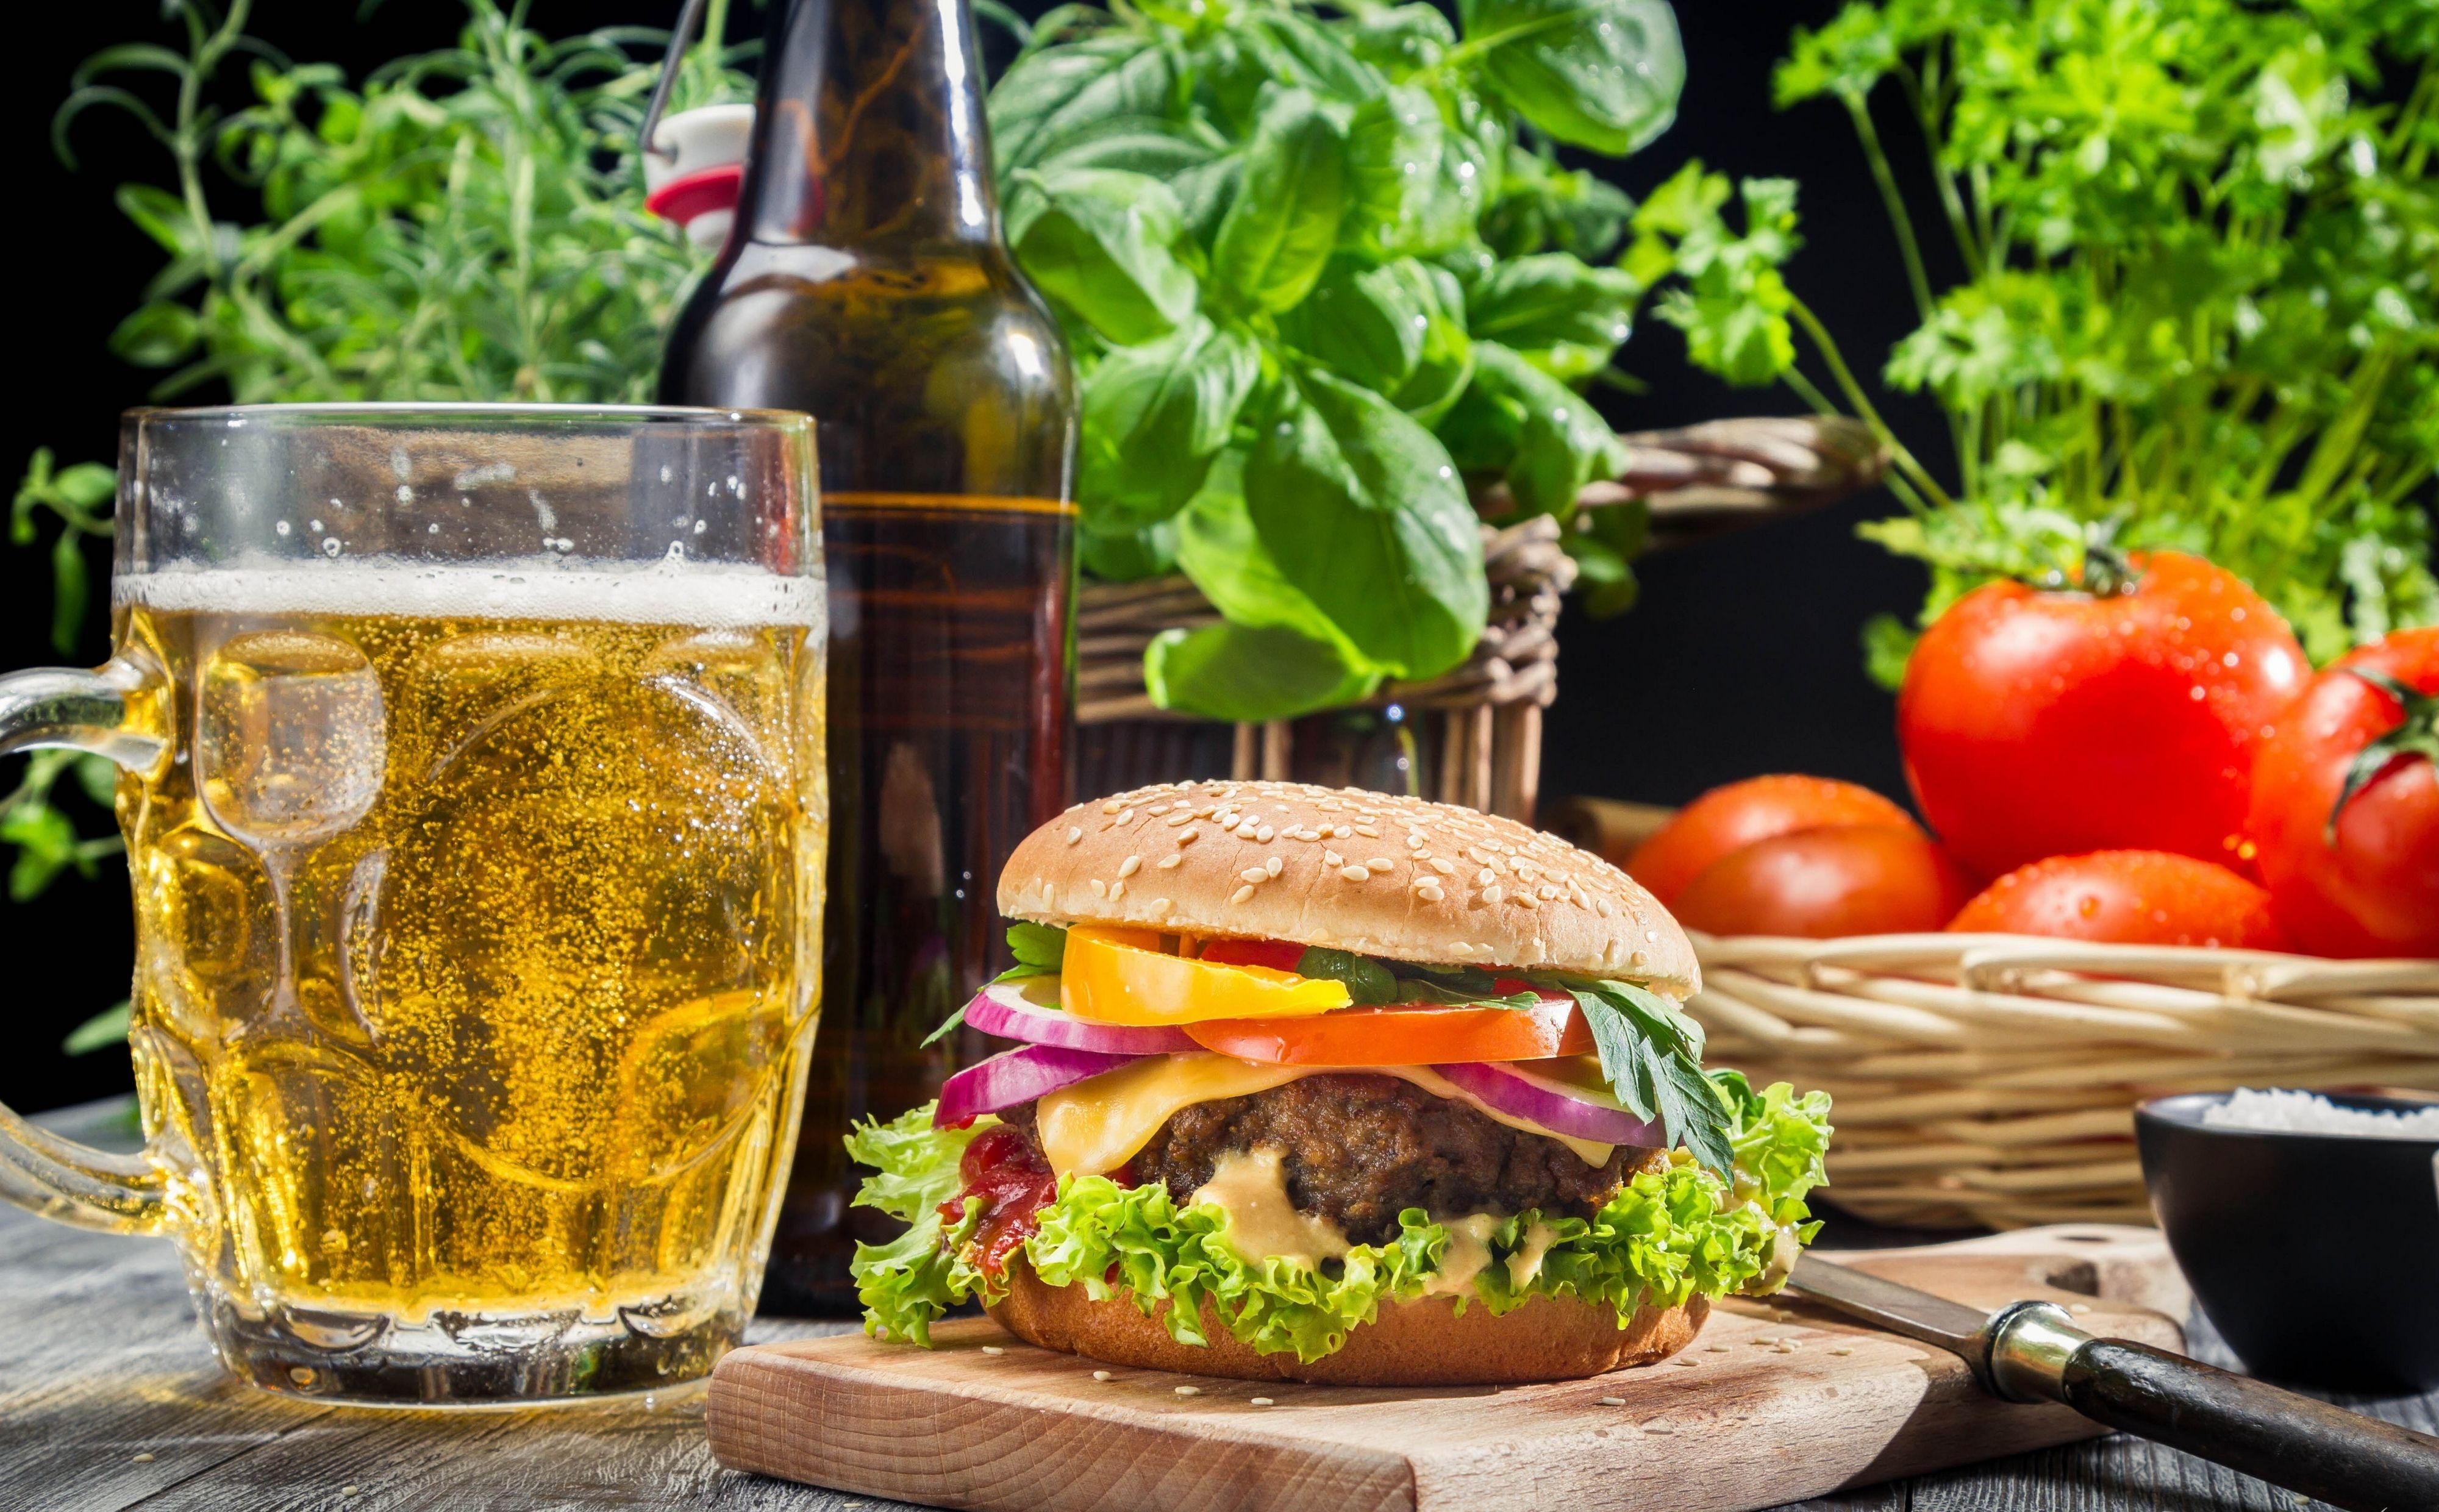 burger beer tomatoes glass green wallpaper 4000x2480. Black Bedroom Furniture Sets. Home Design Ideas